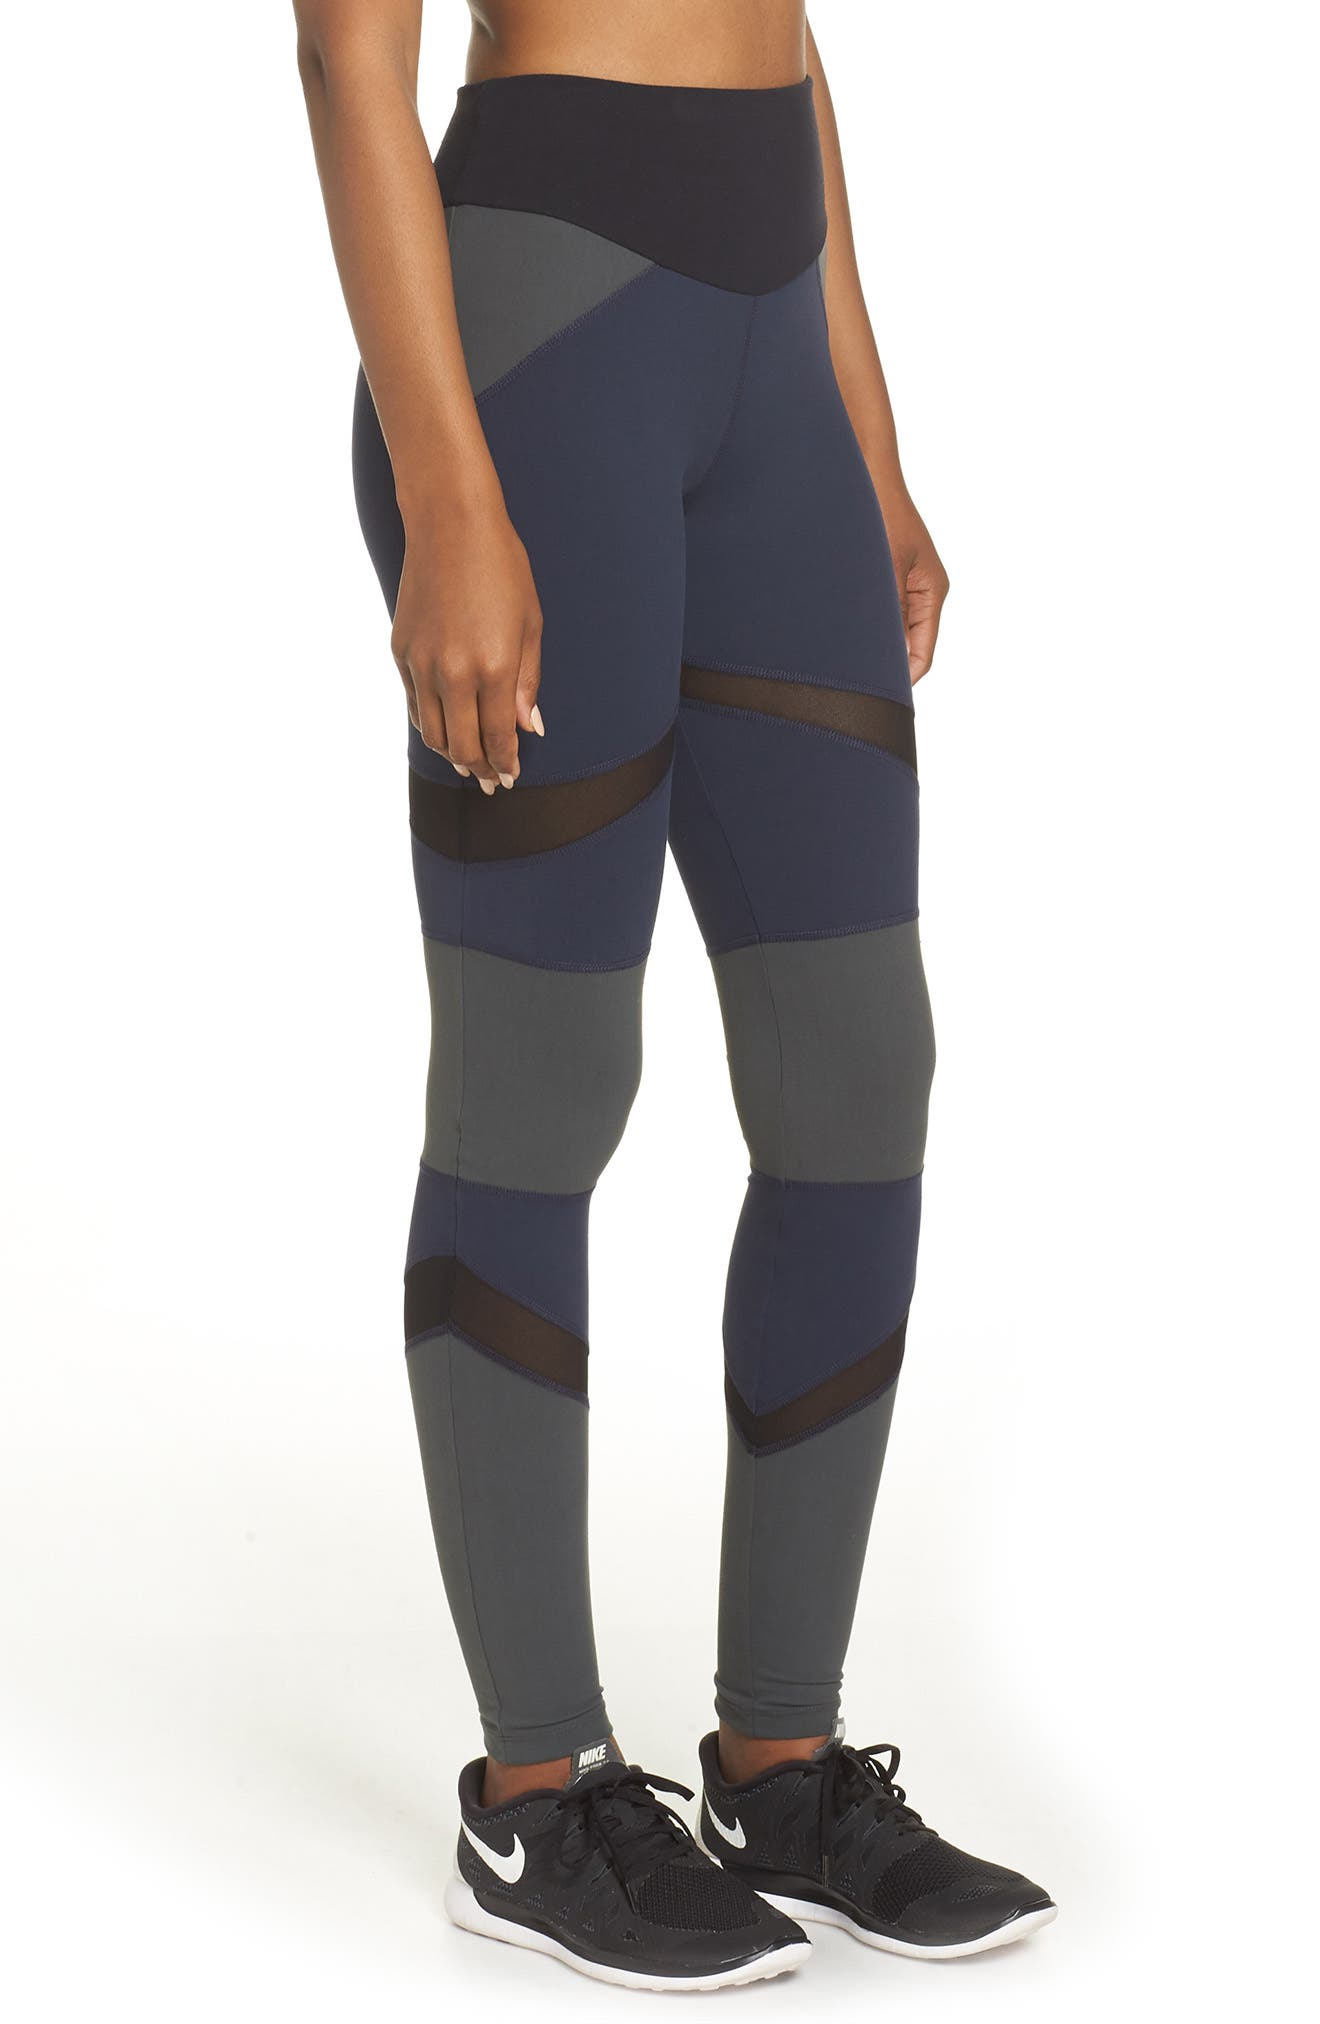 BoomBoom Athletica Brushed Tricolor Panel Leggings,                             Alternate thumbnail 3, color,                             NAVY/ BLACK/ GREEN